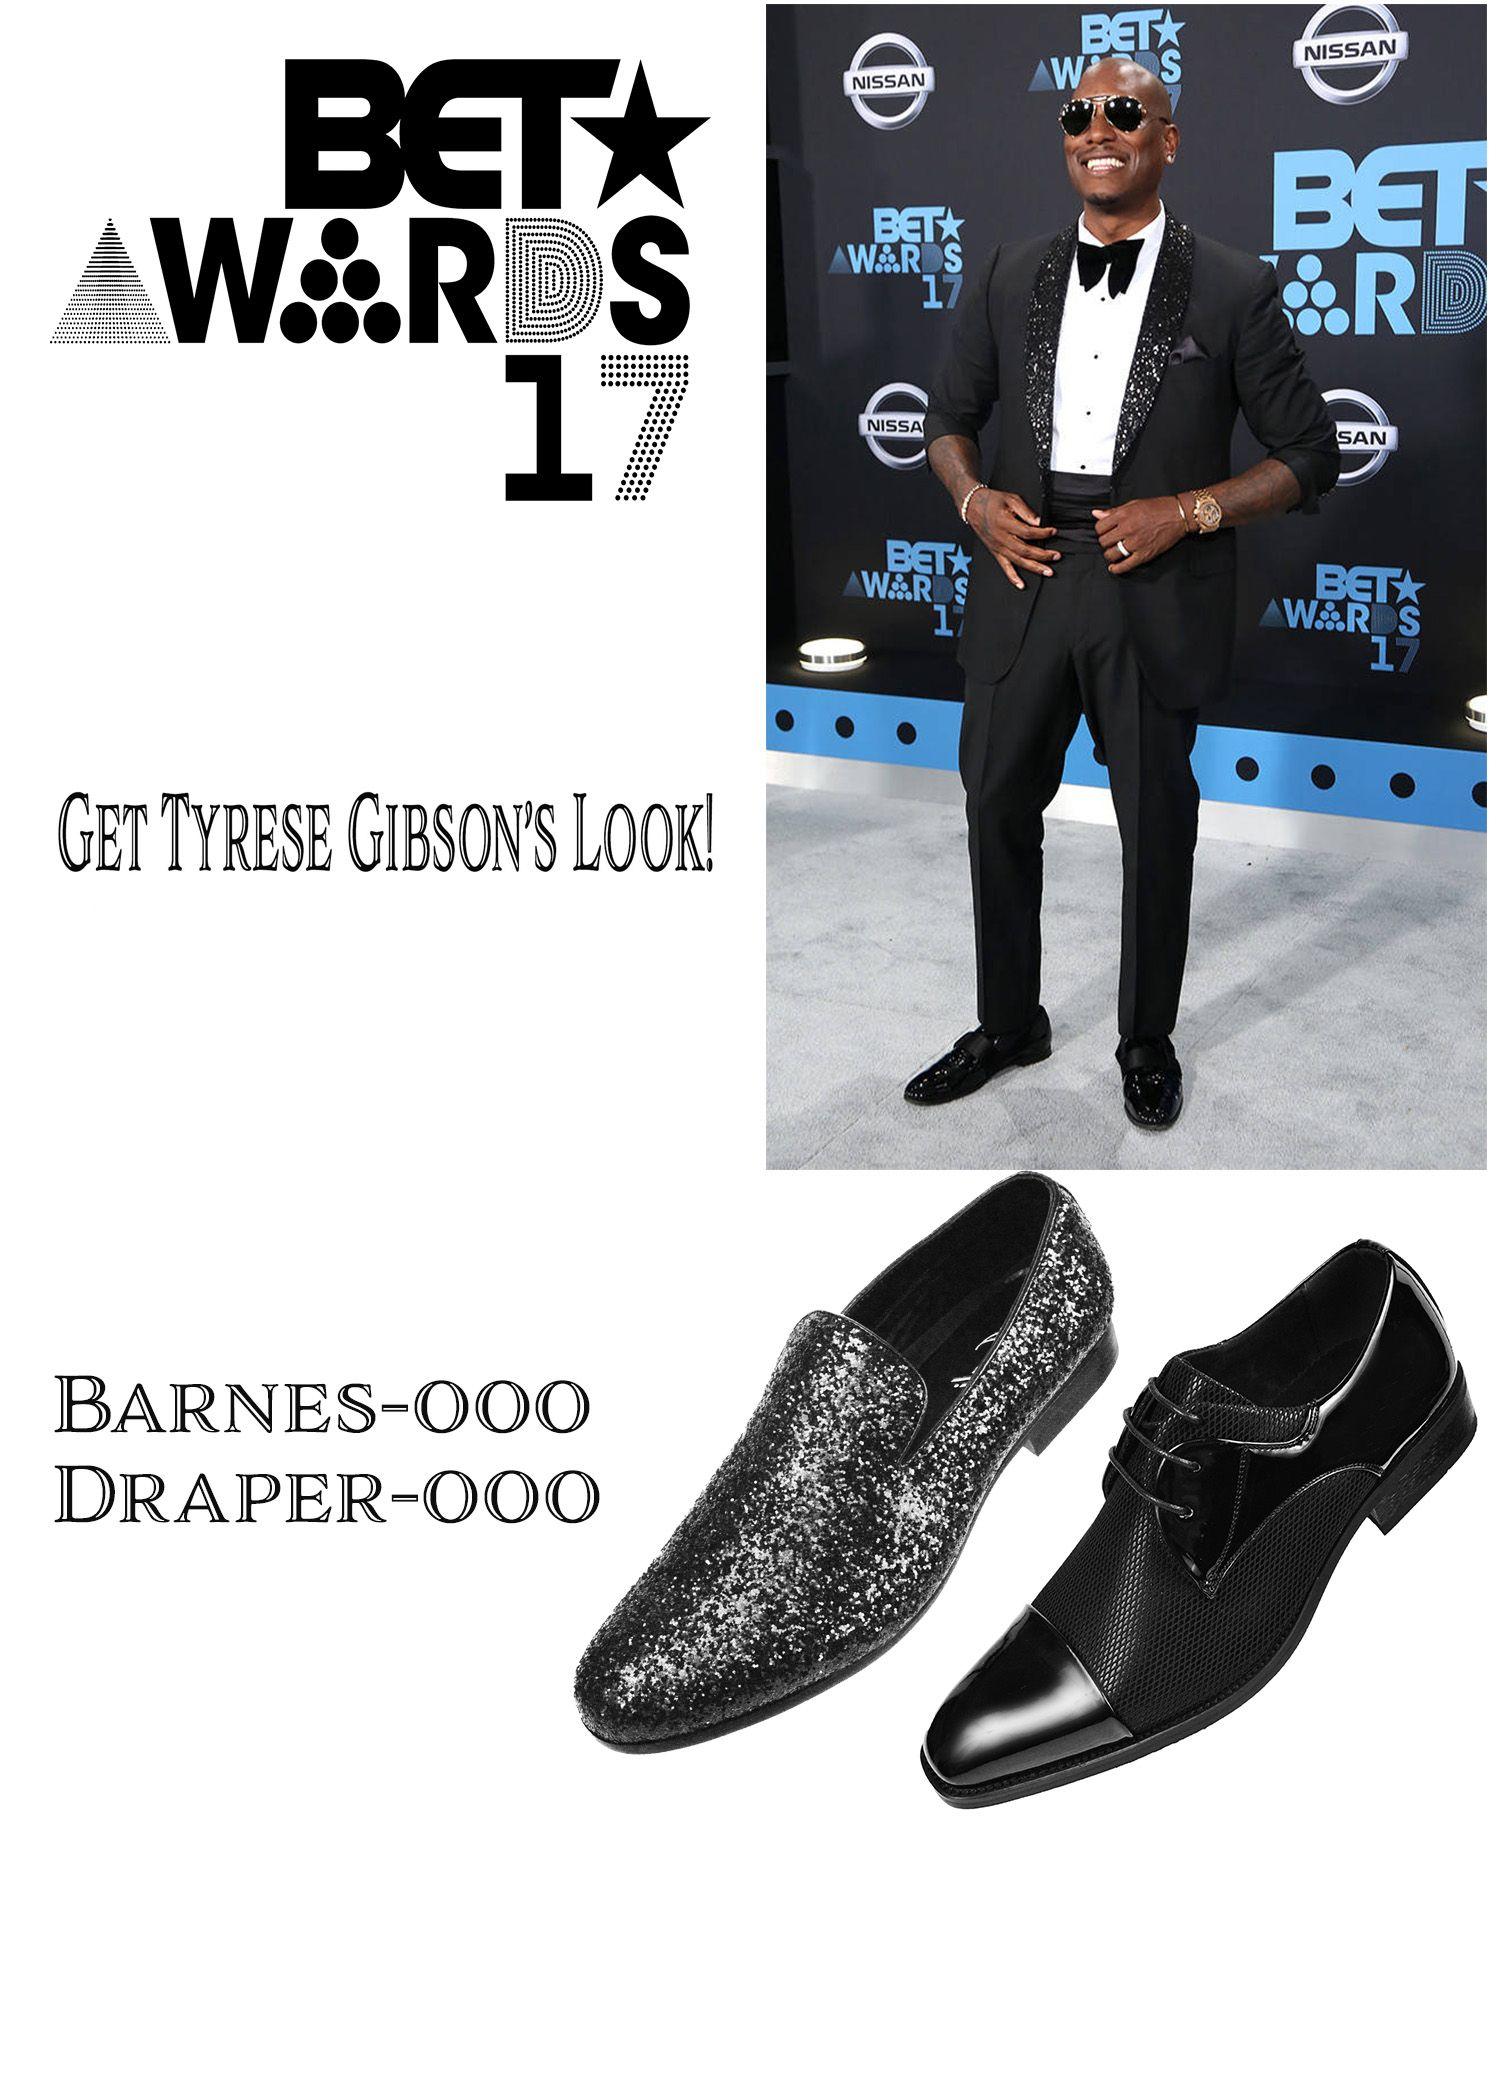 b6c3fc5b0064 Pin by Just Men's Shoes on Get the Look | Oxford shoes, Dress Shoes ...